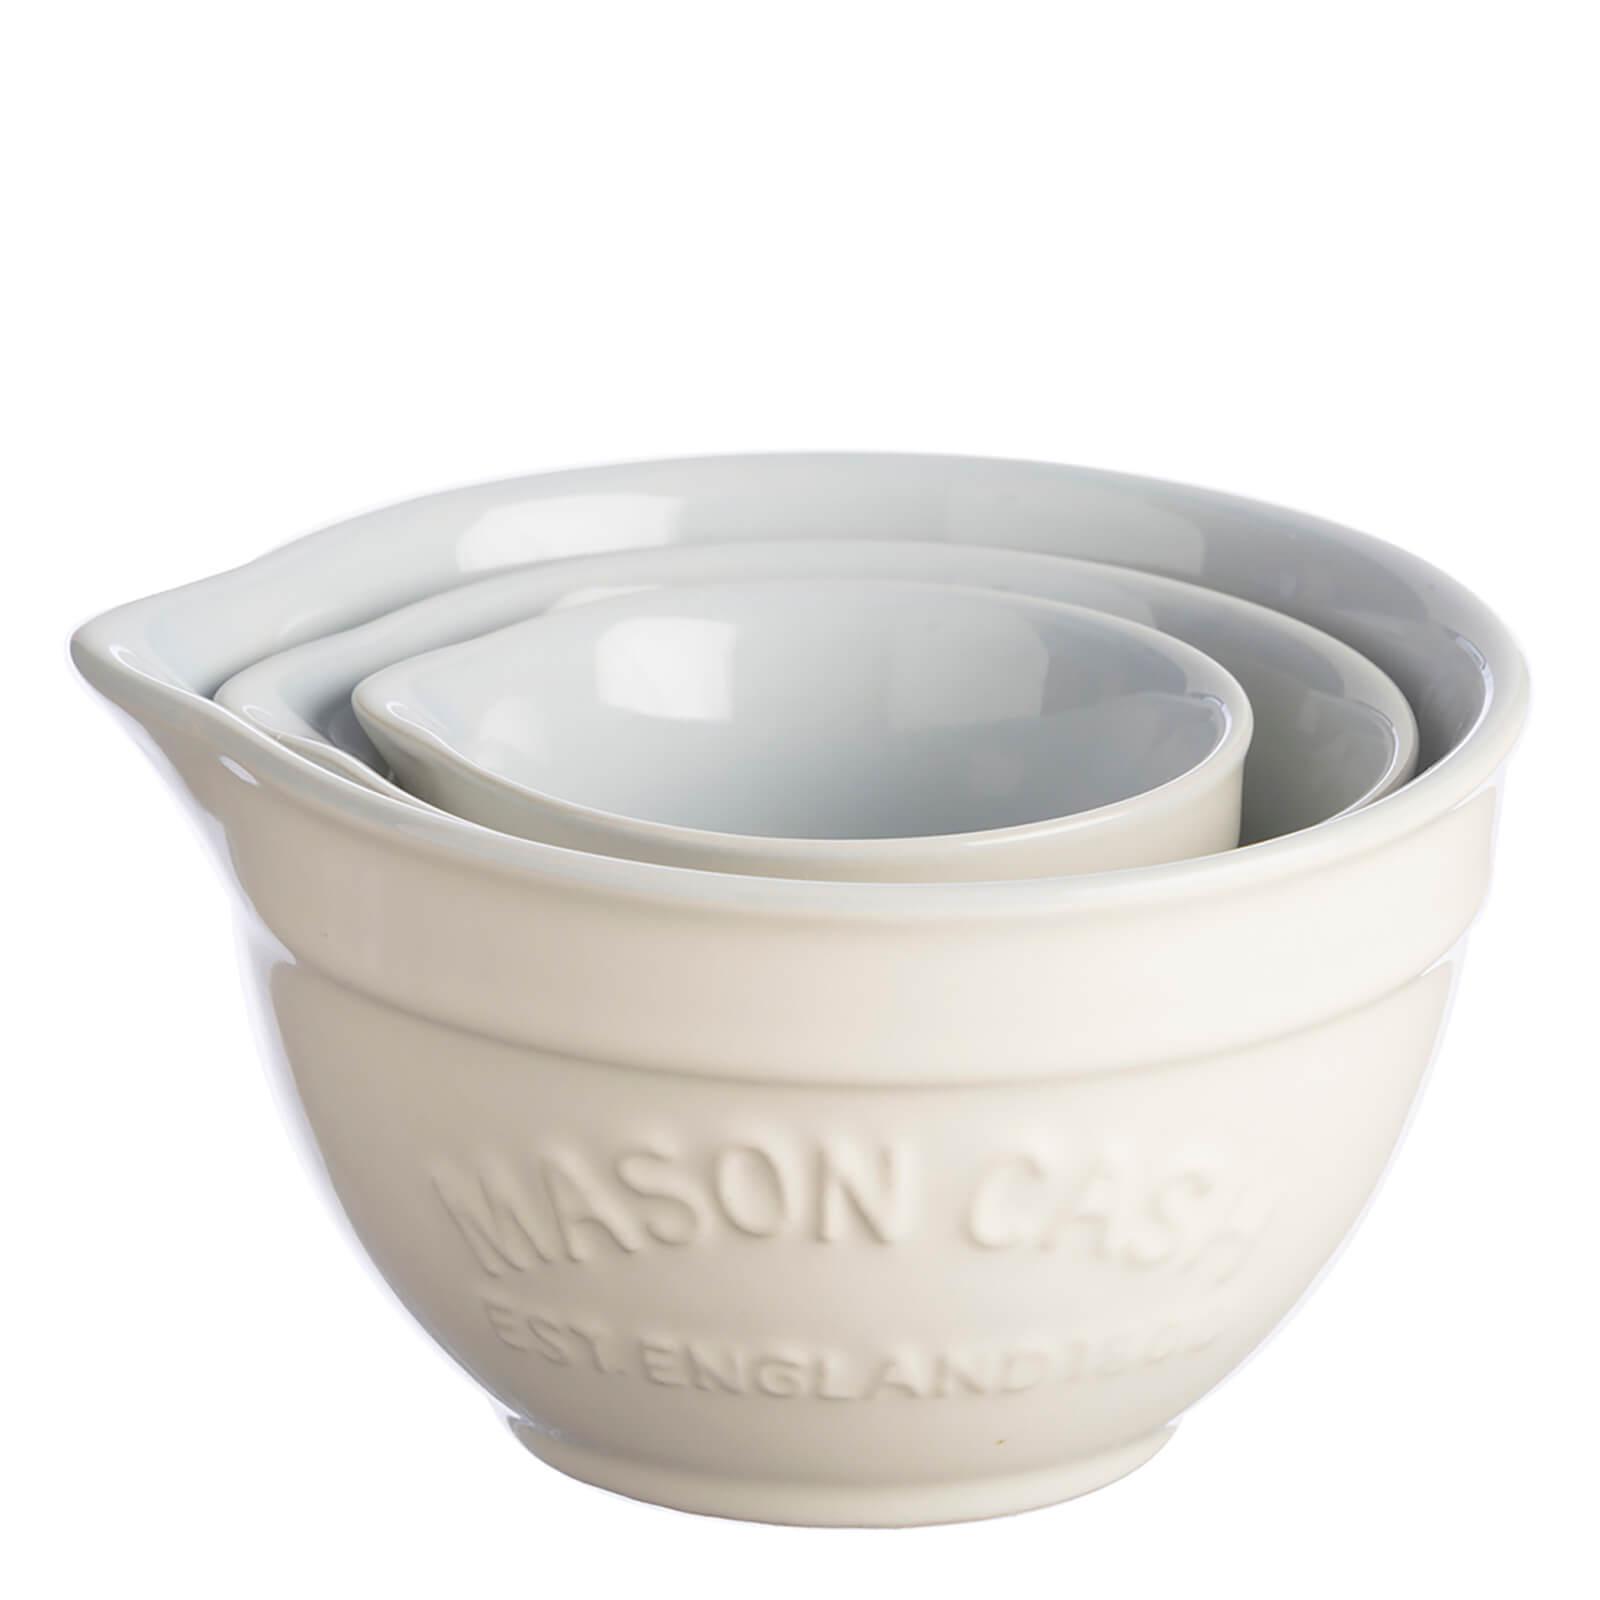 Mason Cash Bakewell Measuring Cups - Cream